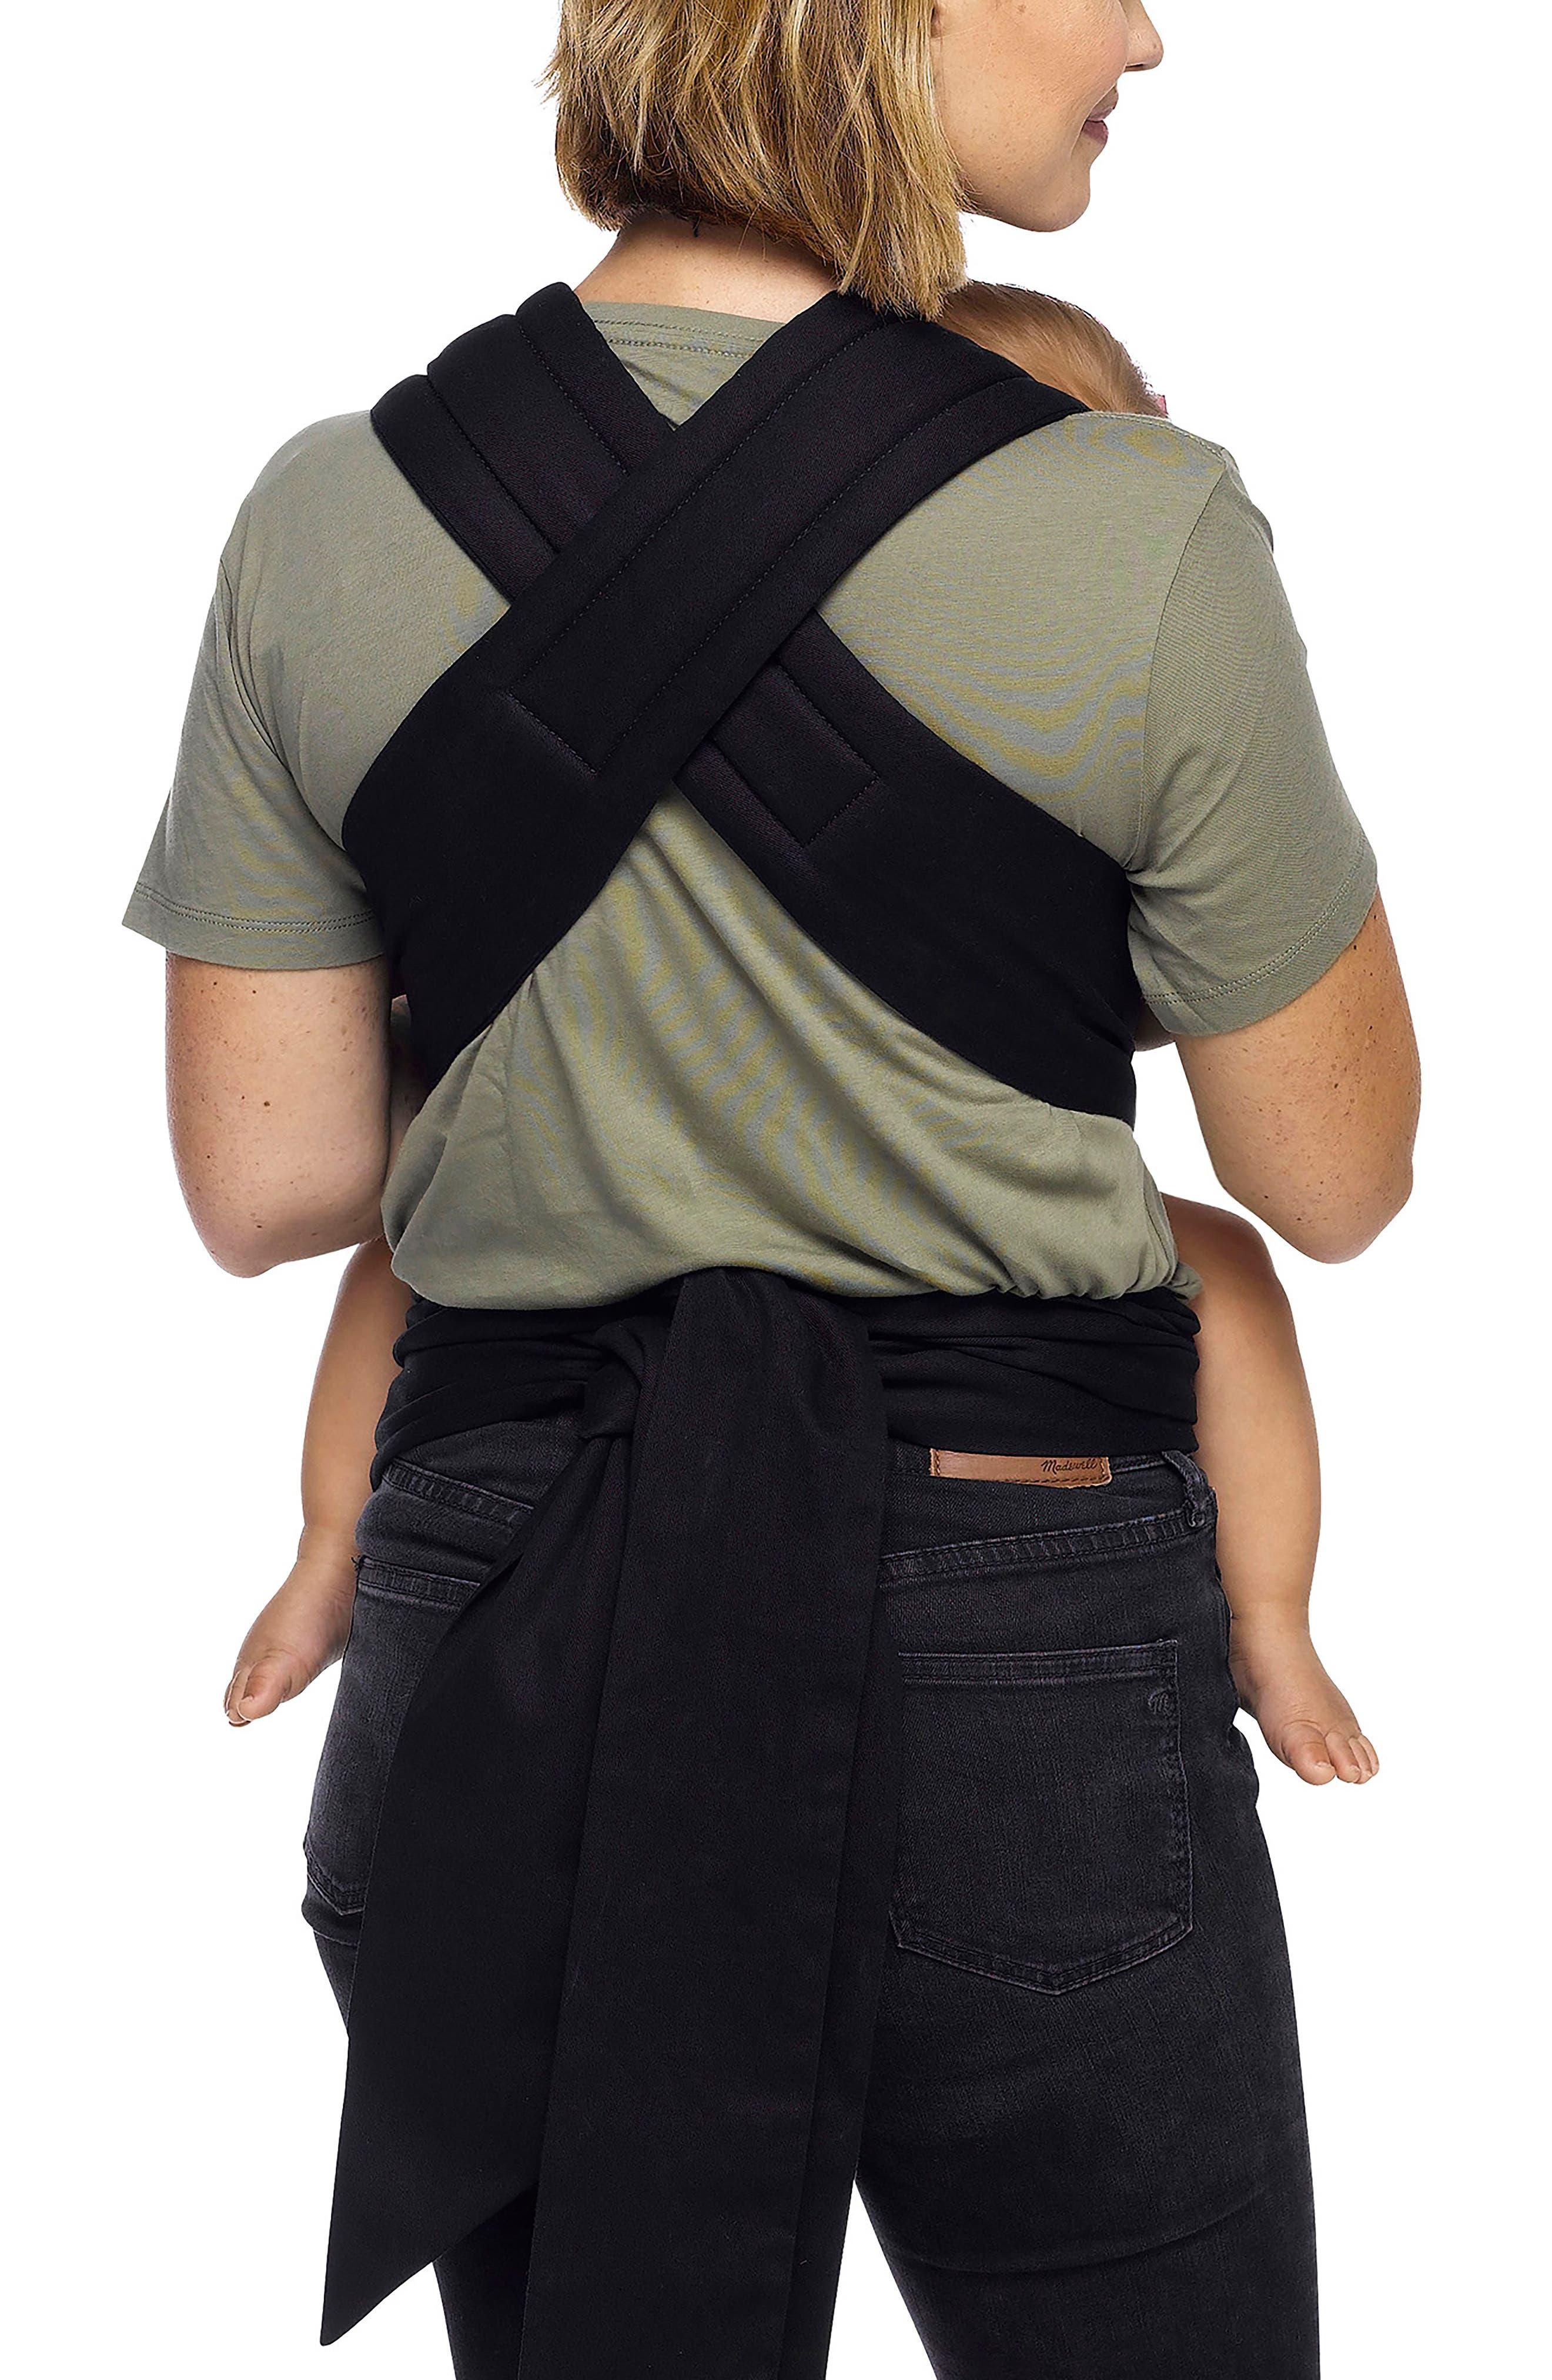 Wrap Double Tie Baby Carrier,                             Alternate thumbnail 4, color,                             Stripes